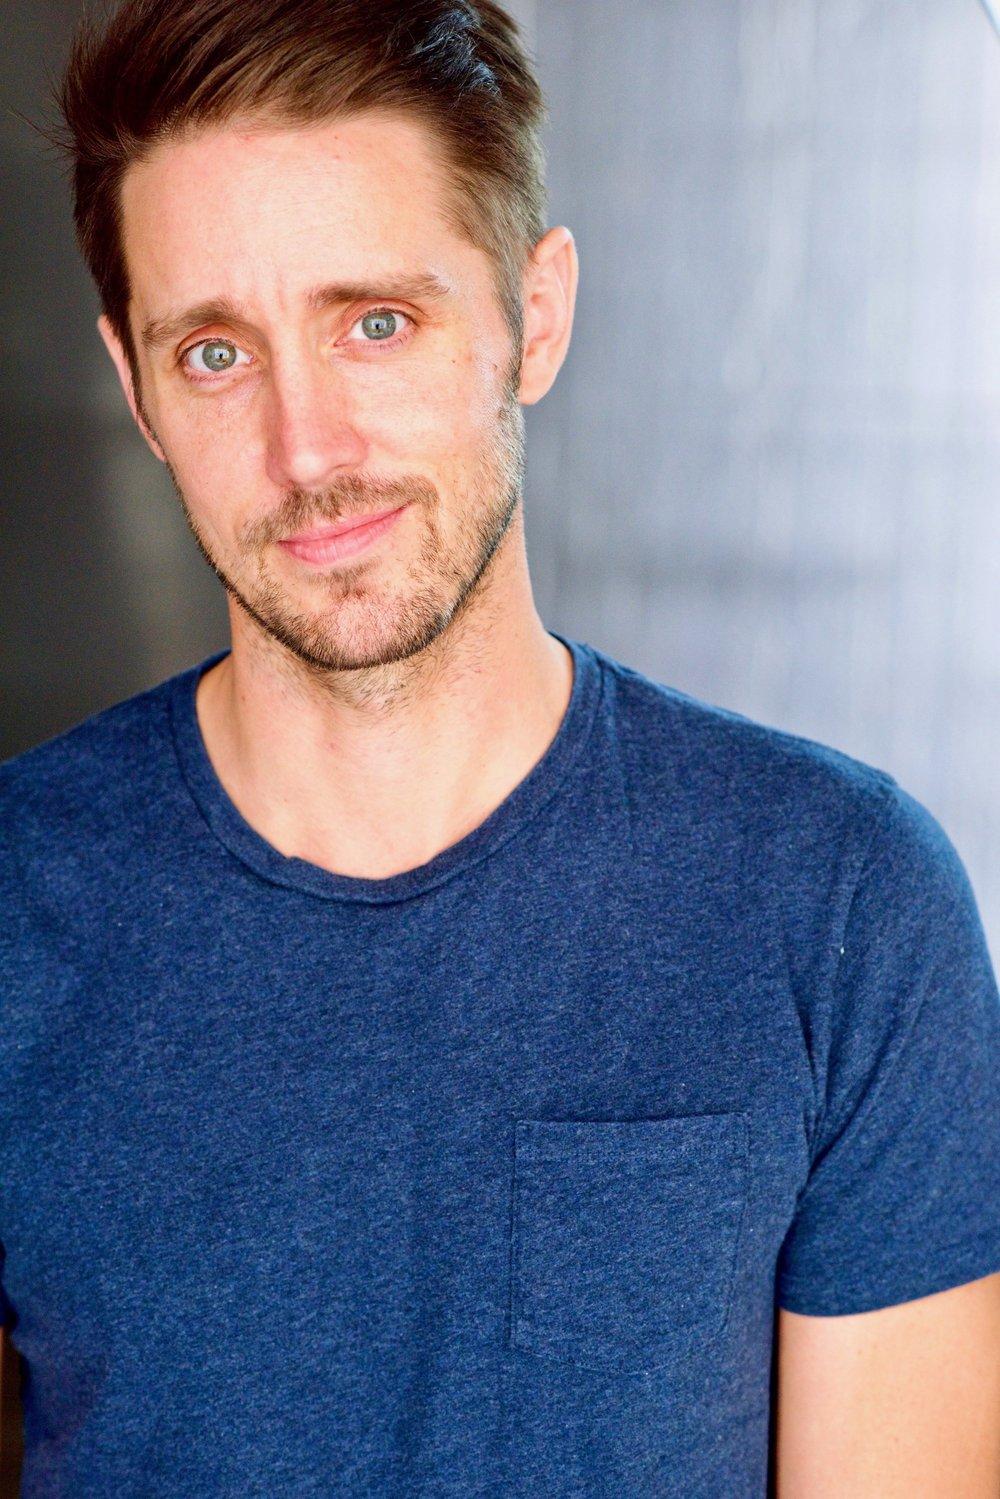 Deacon Conroy, Yoga Instructor